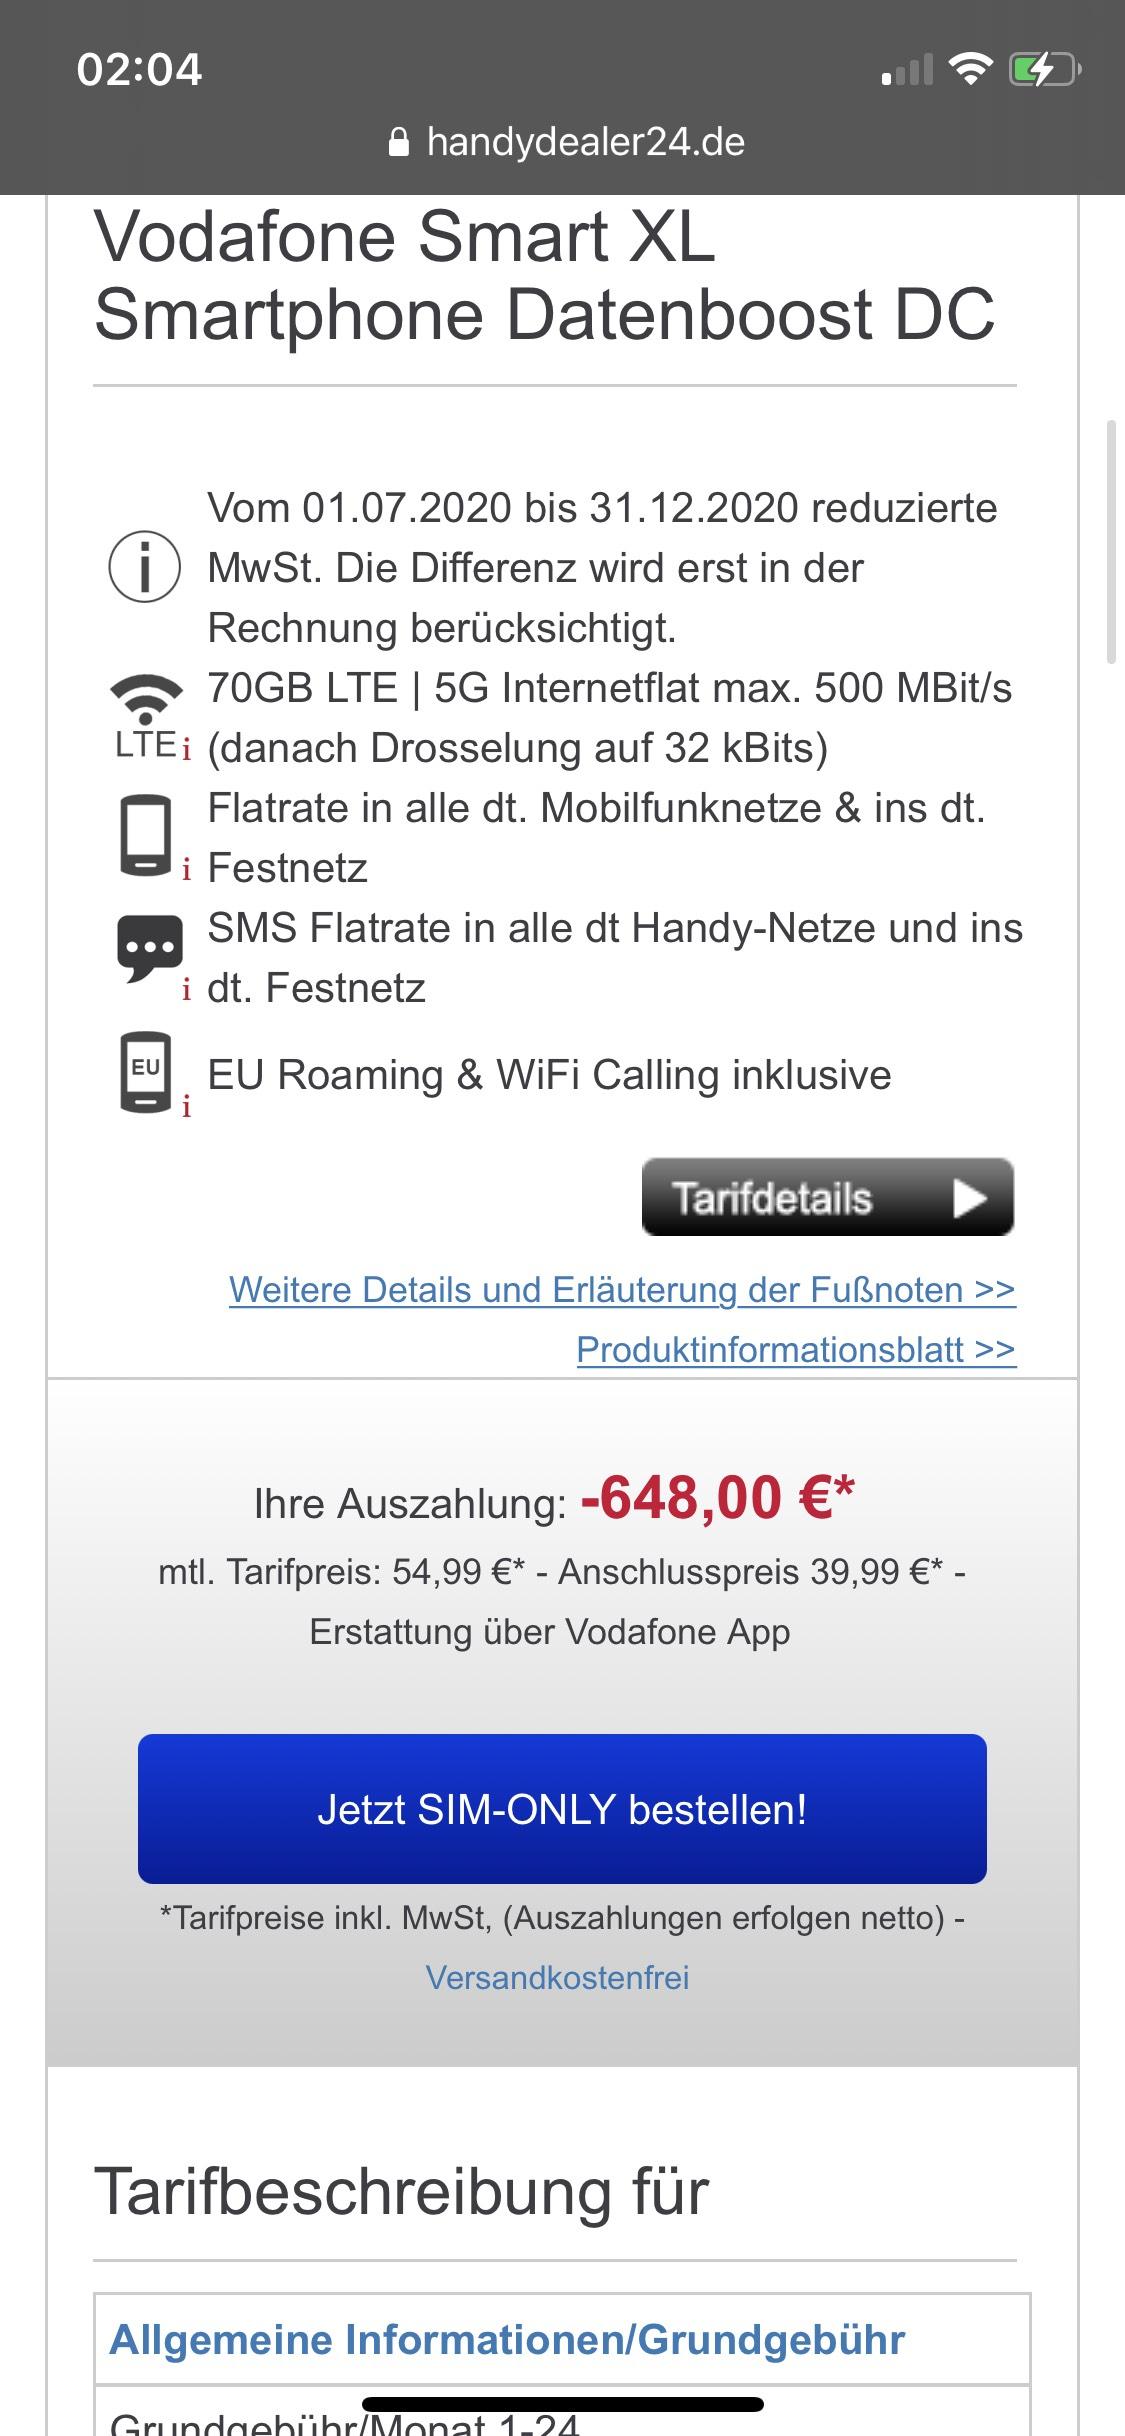 [Normalos] 70GB Vodafone 5G inkl. Wifi Calling eff. 27,91 durch 648€ Auszahlung +50€ Gutschrift